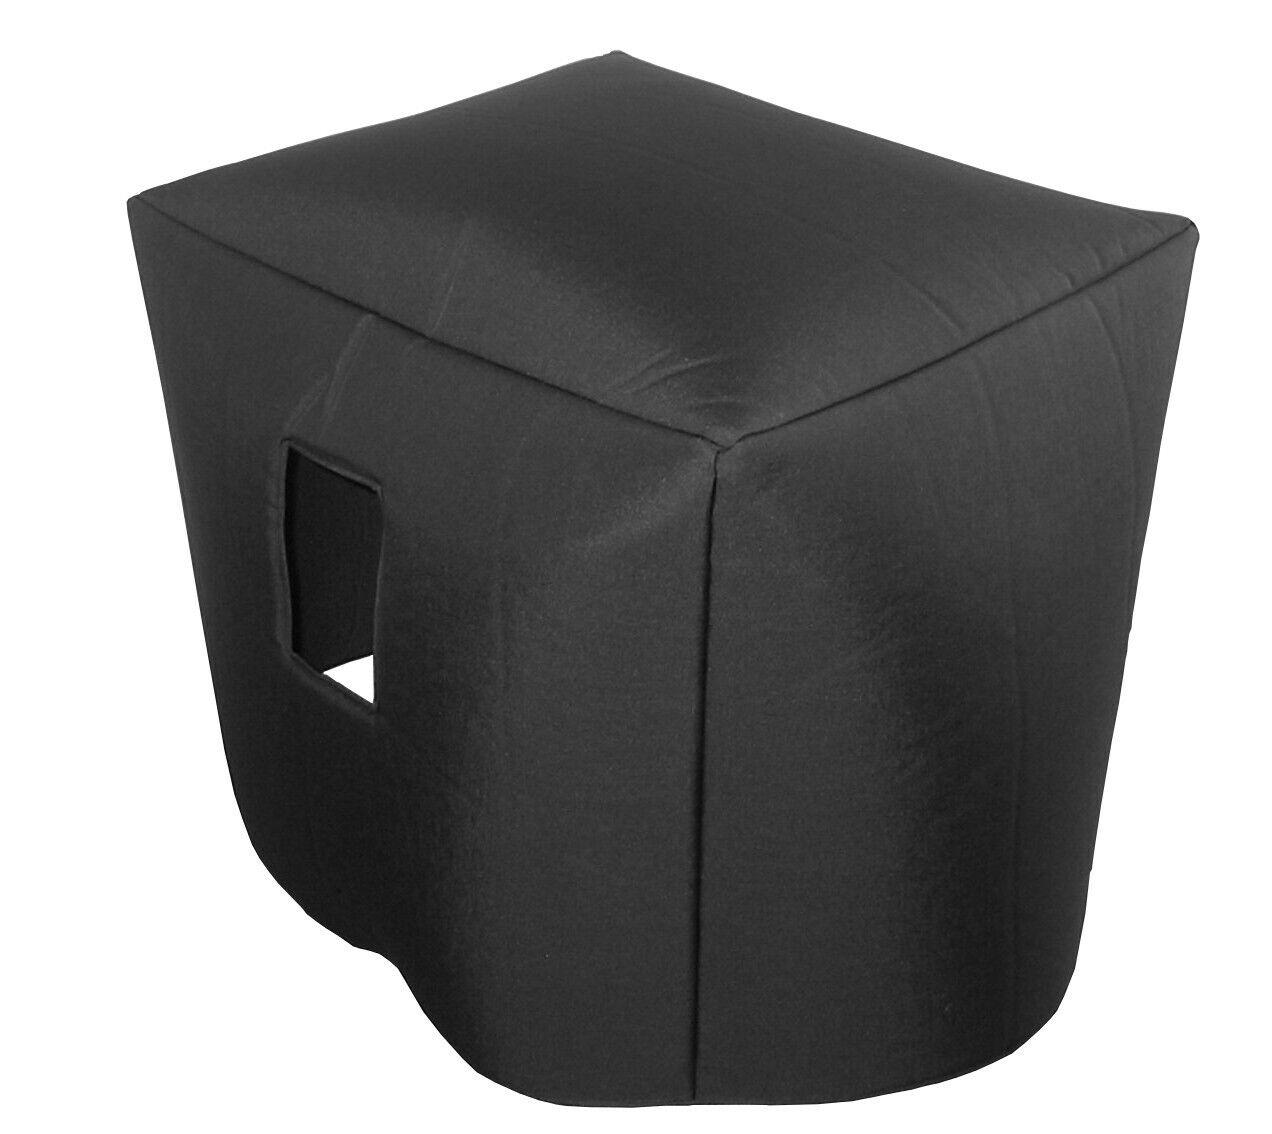 Presonus ULTA18 PA Lautsprecher Cover - Schwarz, Wasser Resistant, Tuki Cover (pres002p)